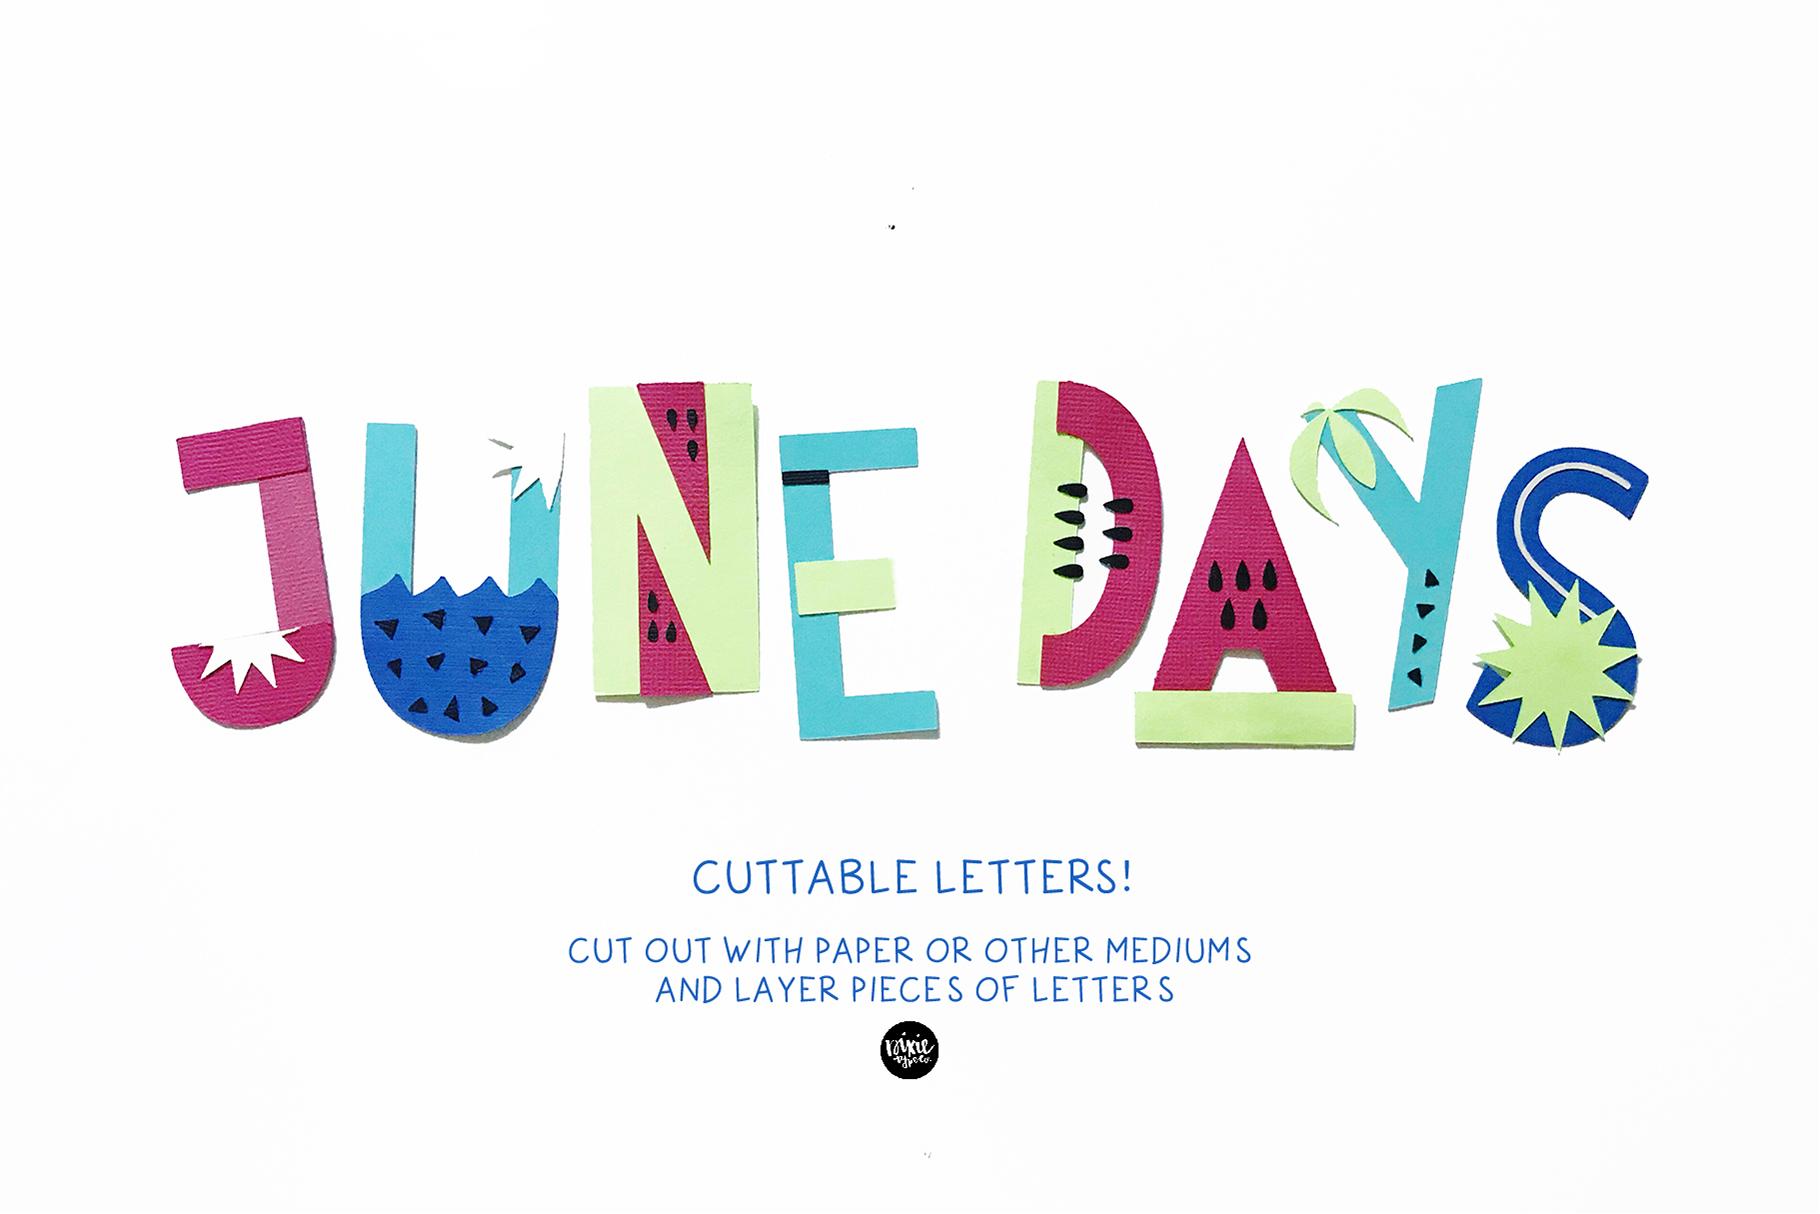 JUNE DAYS OpenType SVG otf Font example image 6